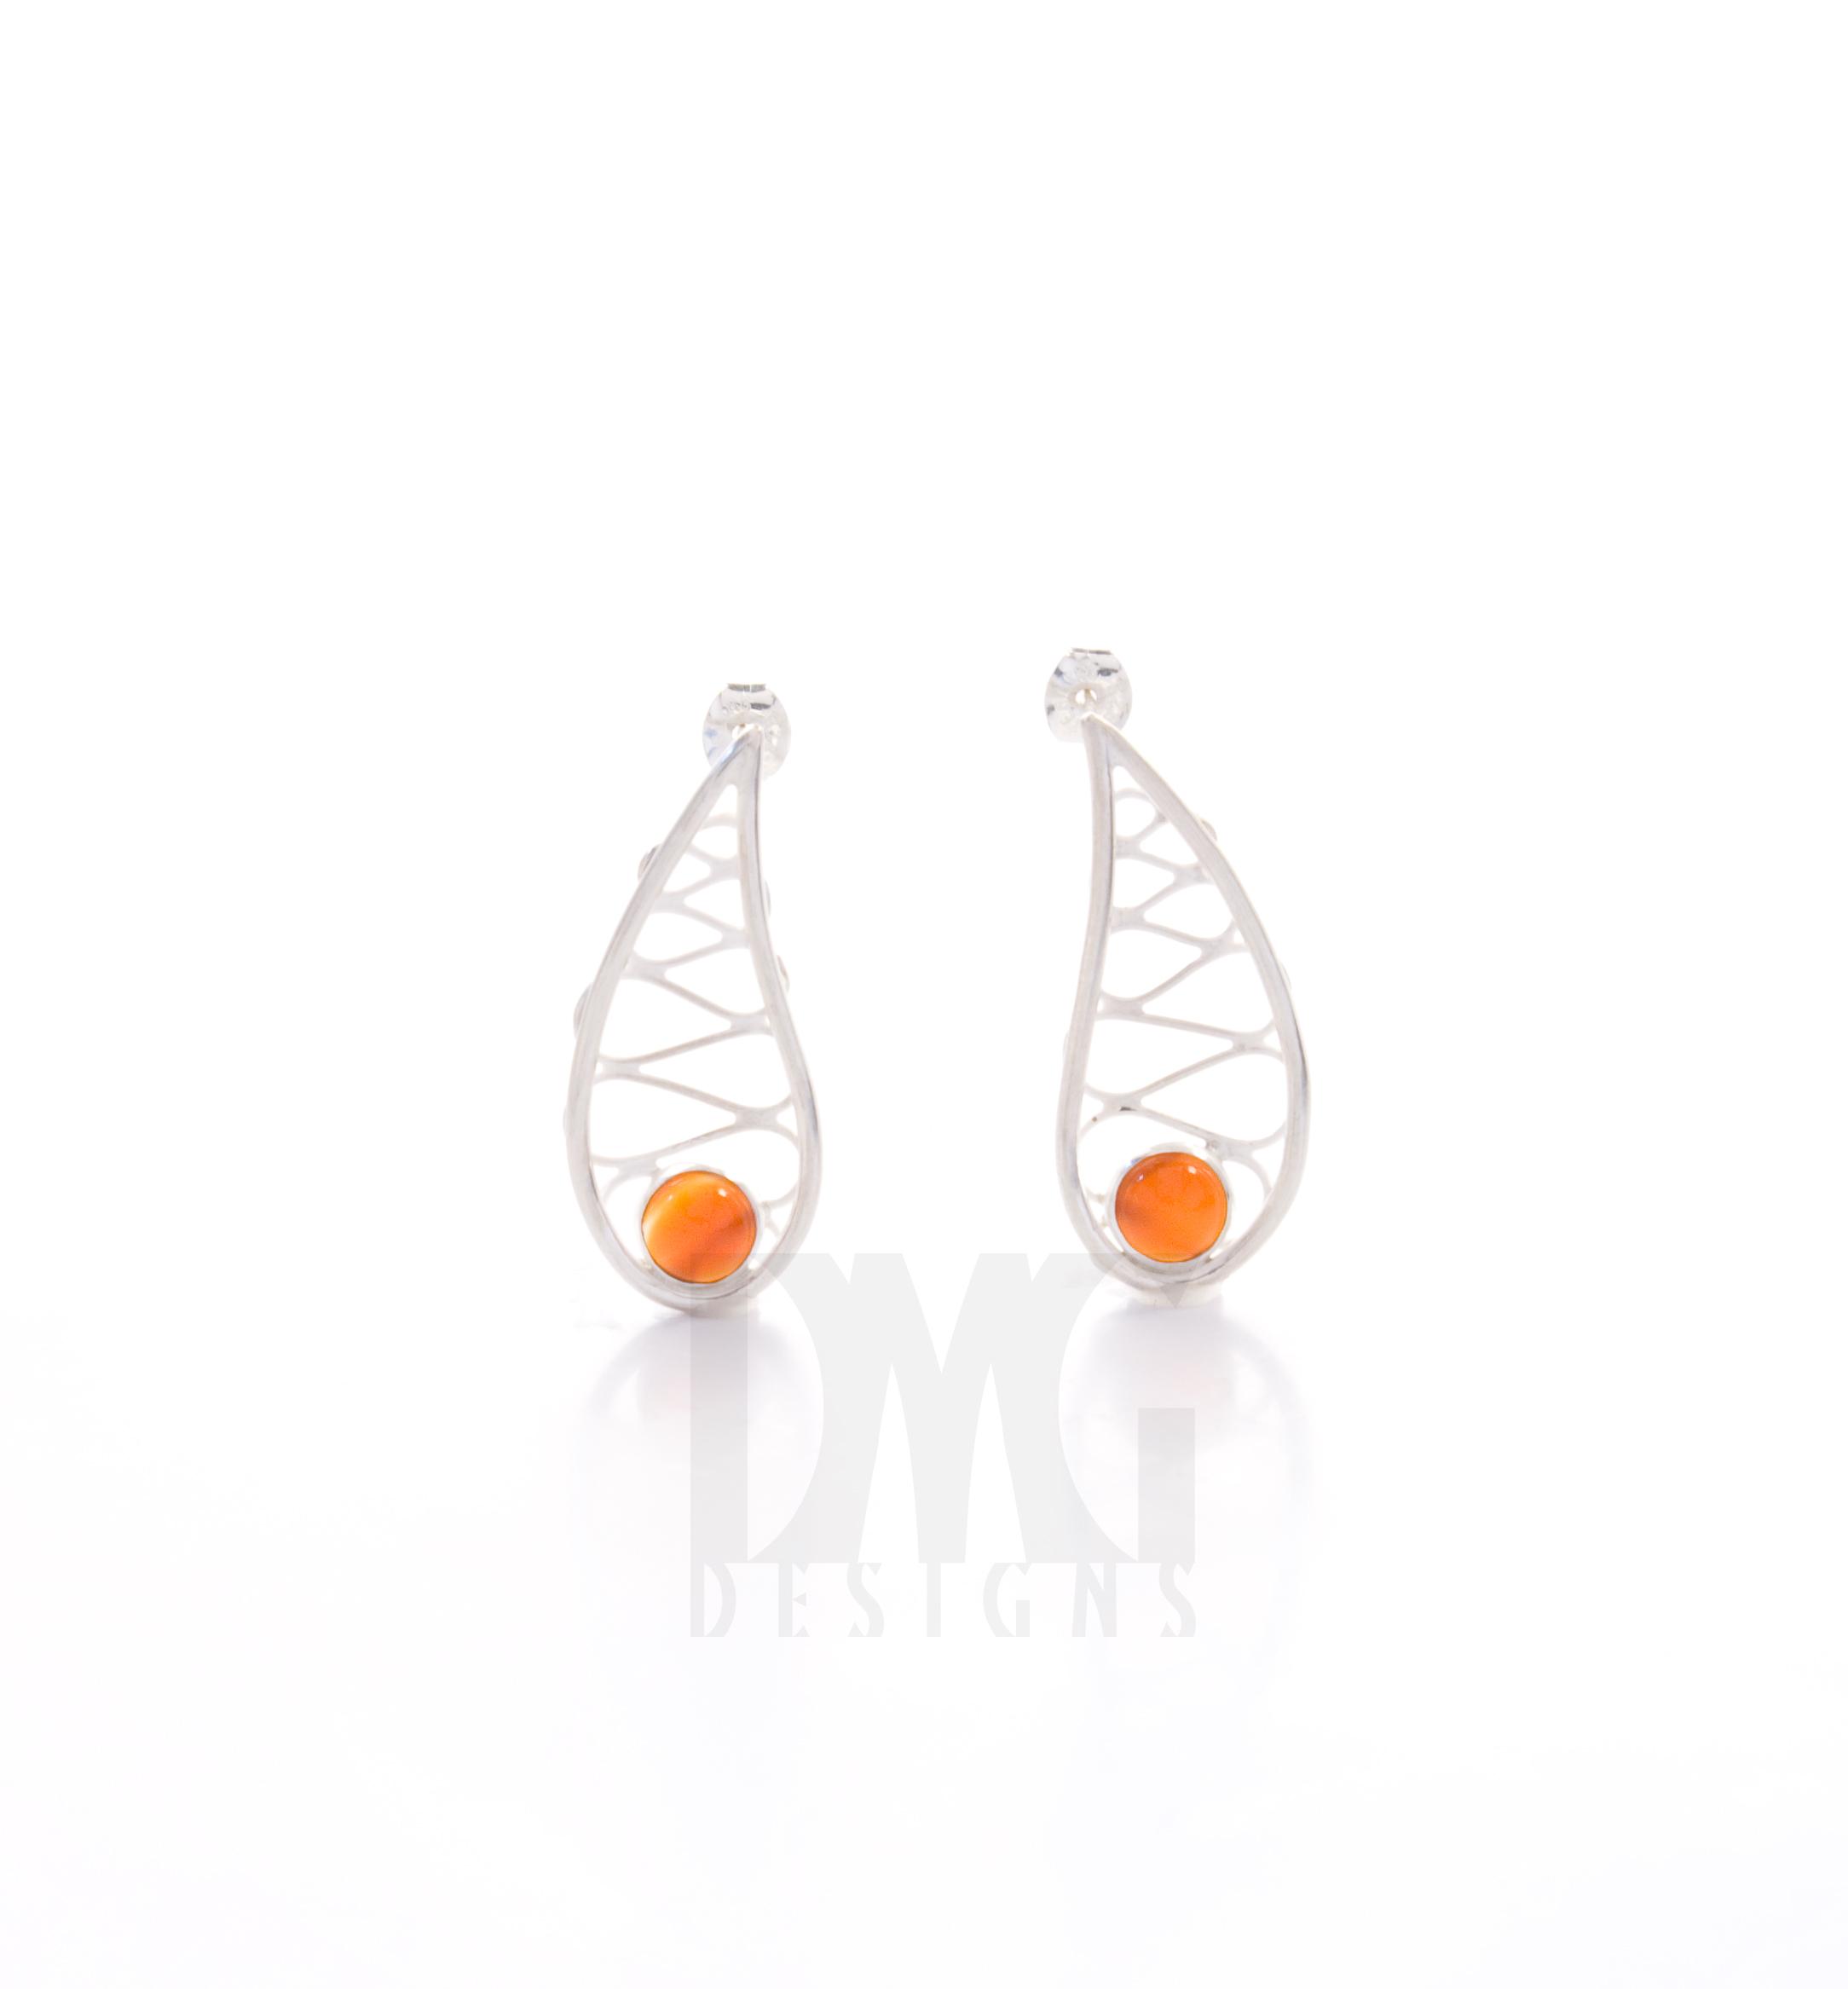 Carnelian Leaf Wirework Gesture Earrings